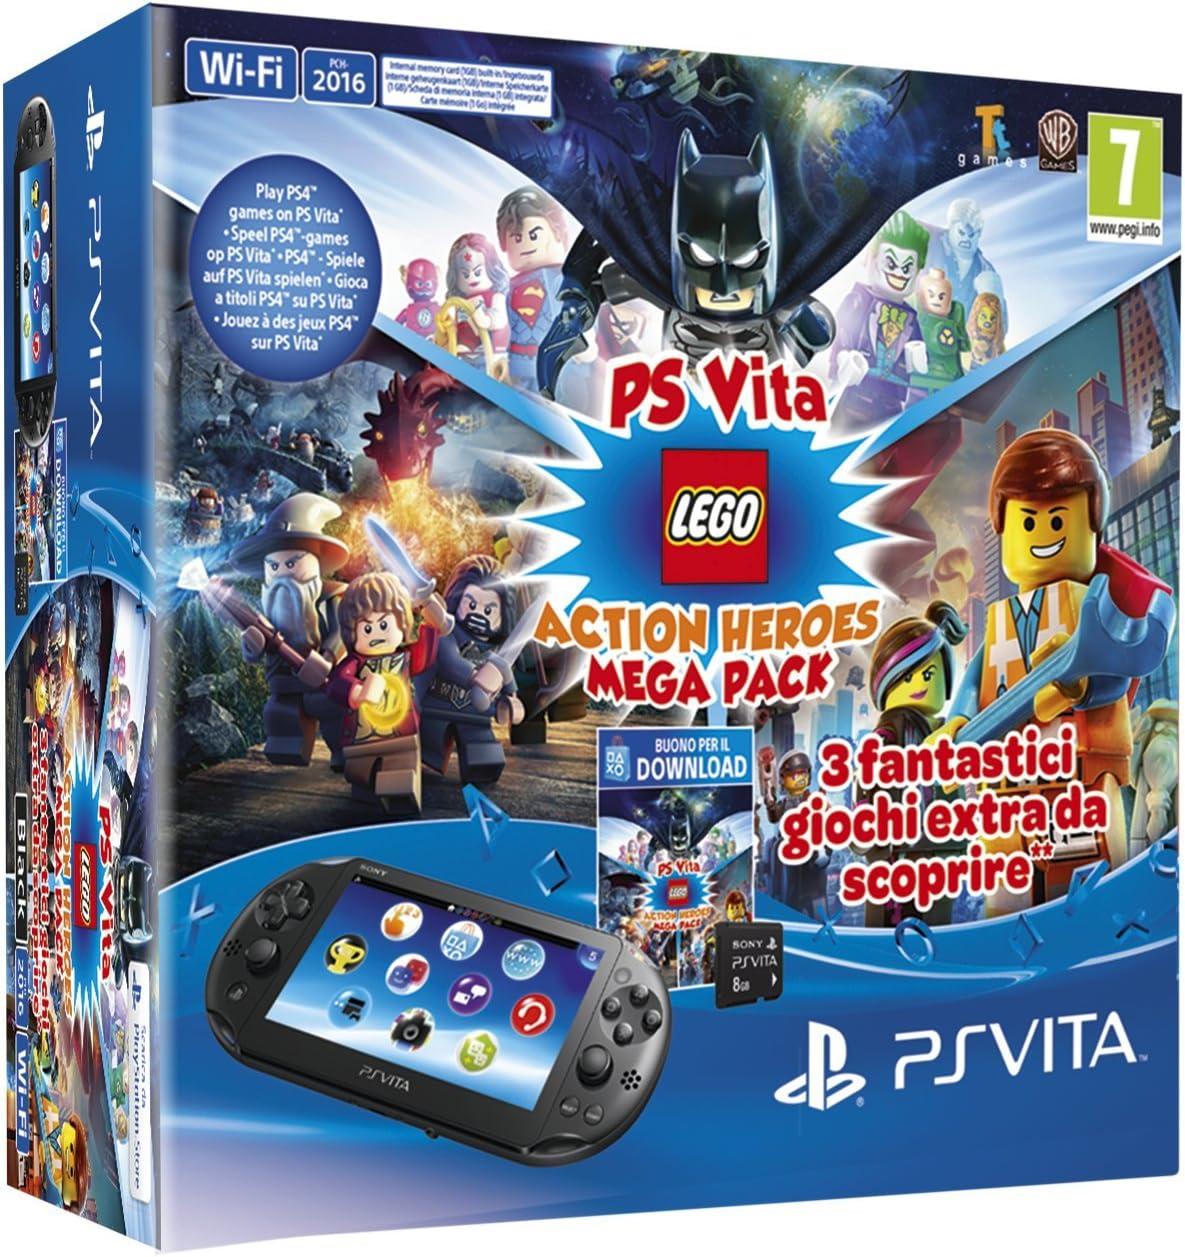 Playstation Vita 2016 + Mega Pack Lego Heroes + Mc 8GB [Bundle ...